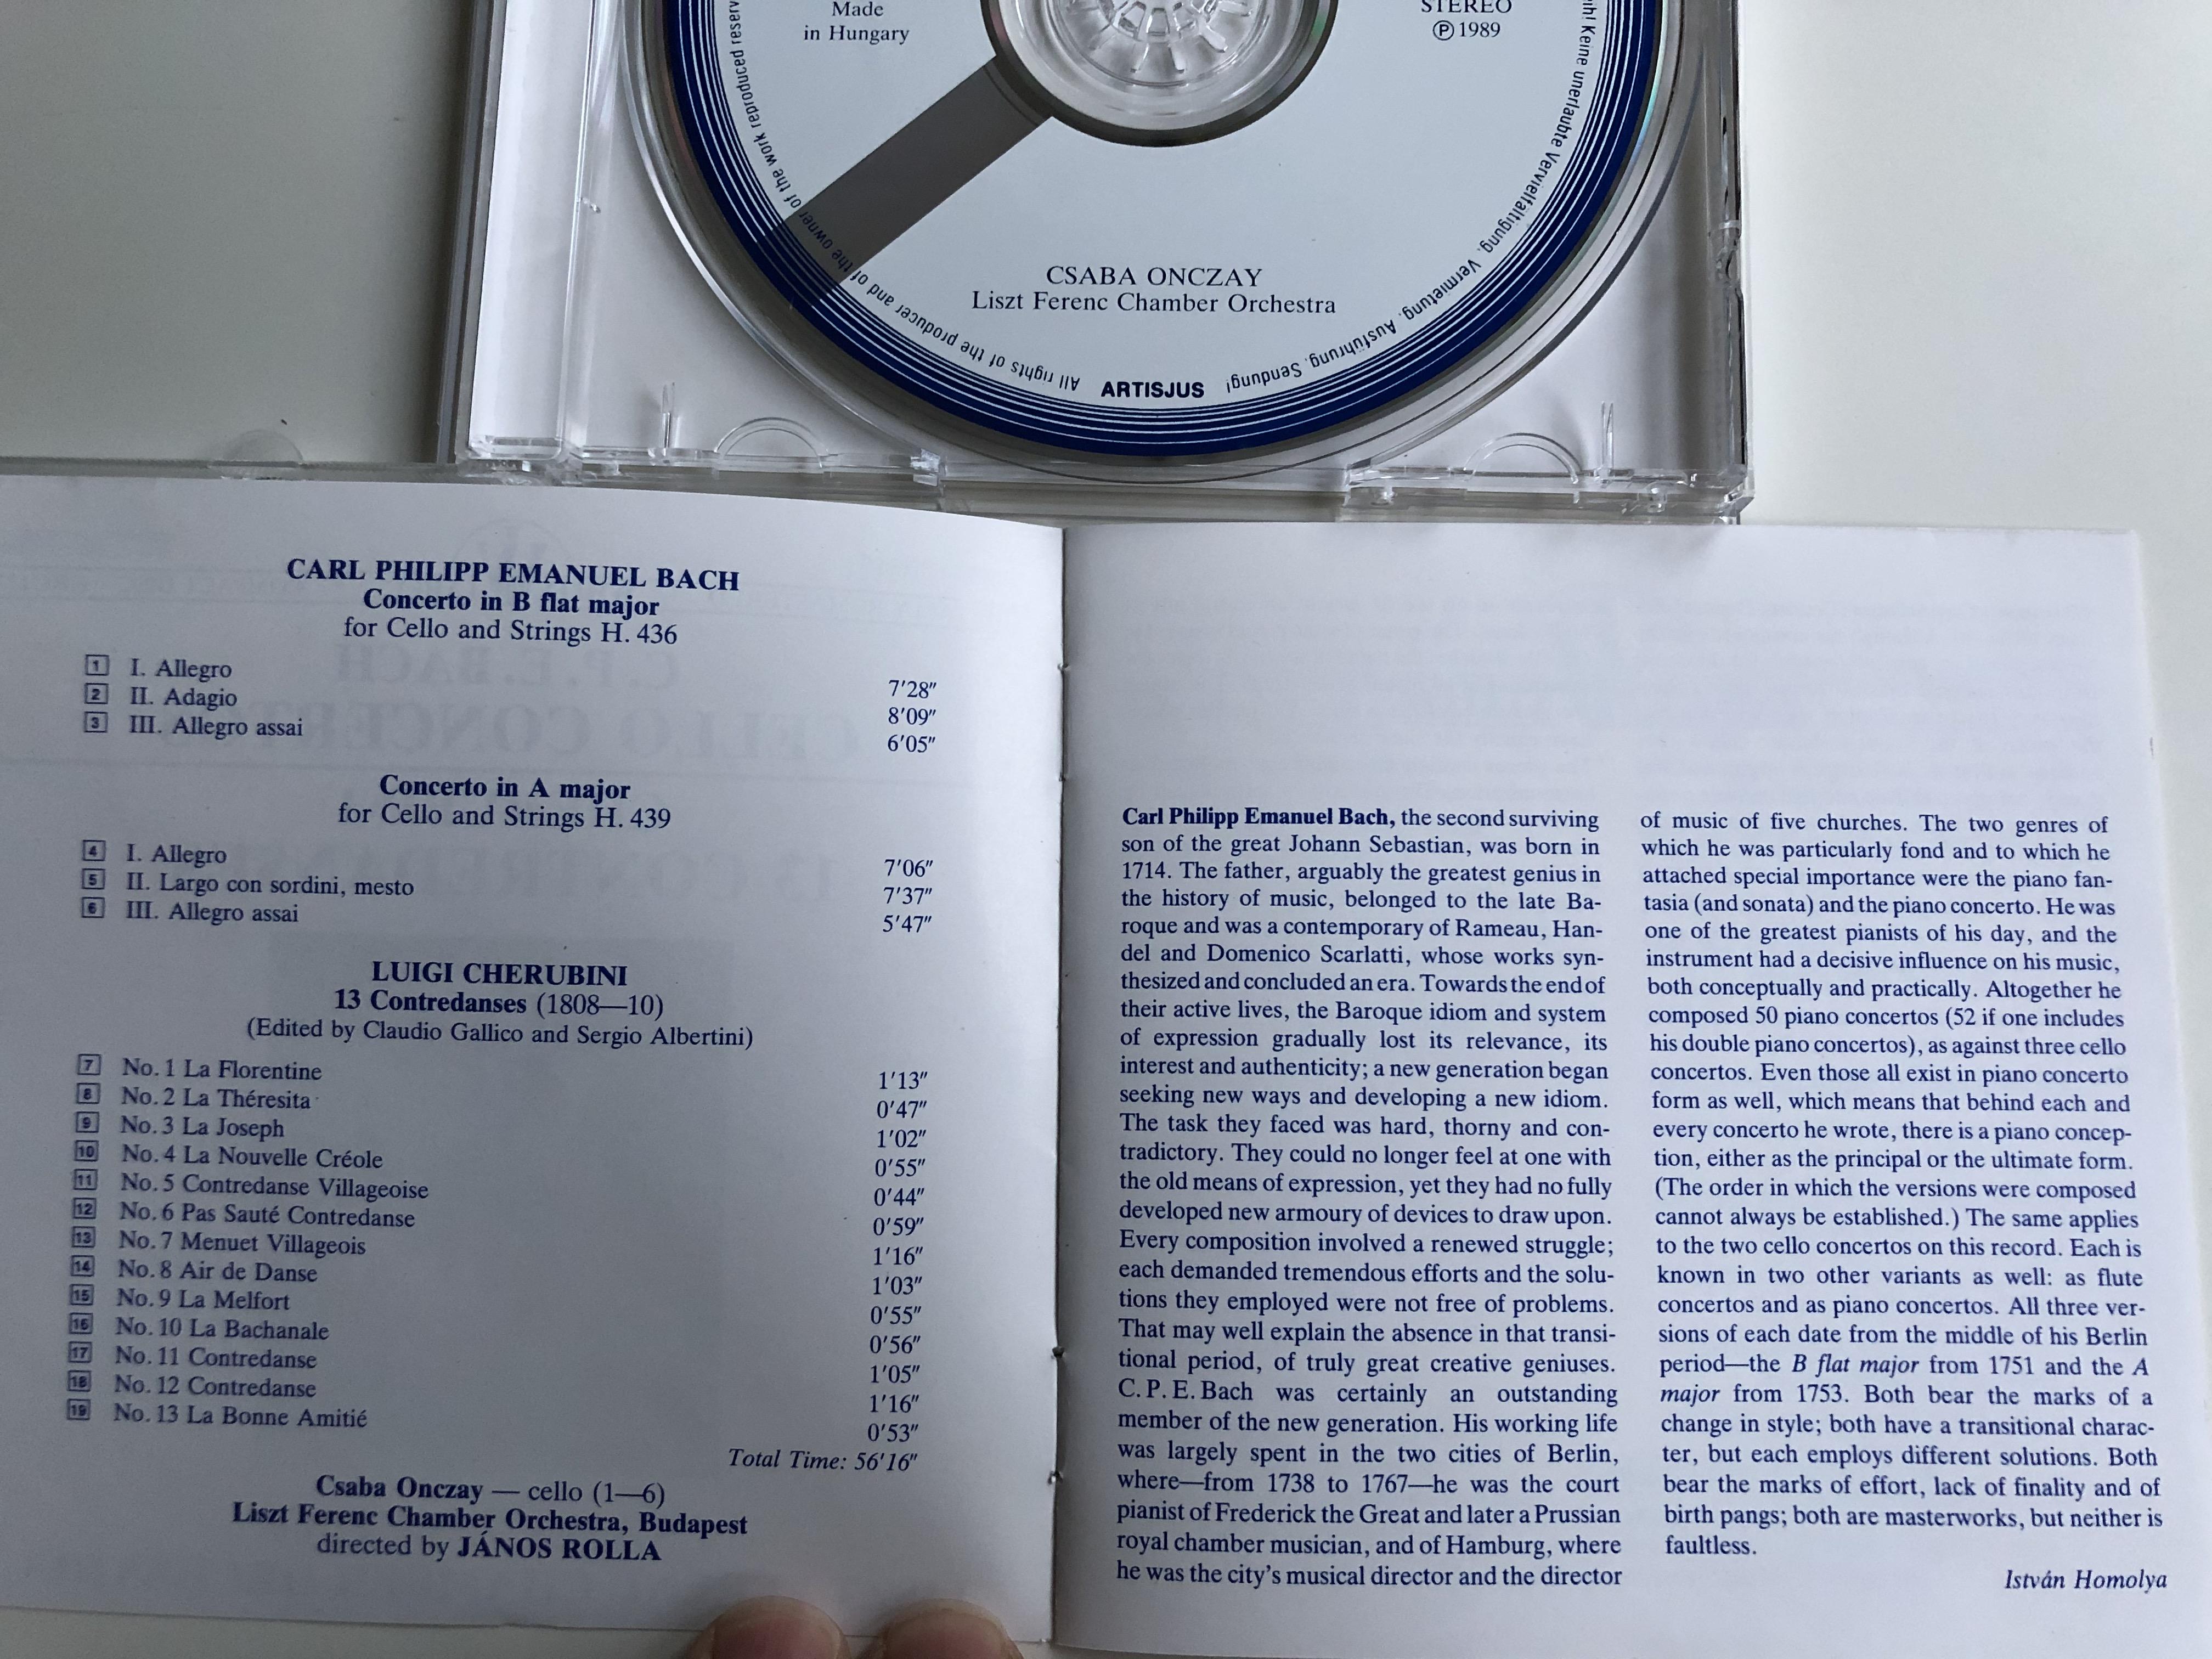 c.p.e.-bach-cello-concertos-cherubin-13-contredanses-csaba-onczay-liszt-ferenc-chamber-orchestra-white-label-audio-cd-1989-stereo-hrc-117-3-.jpg